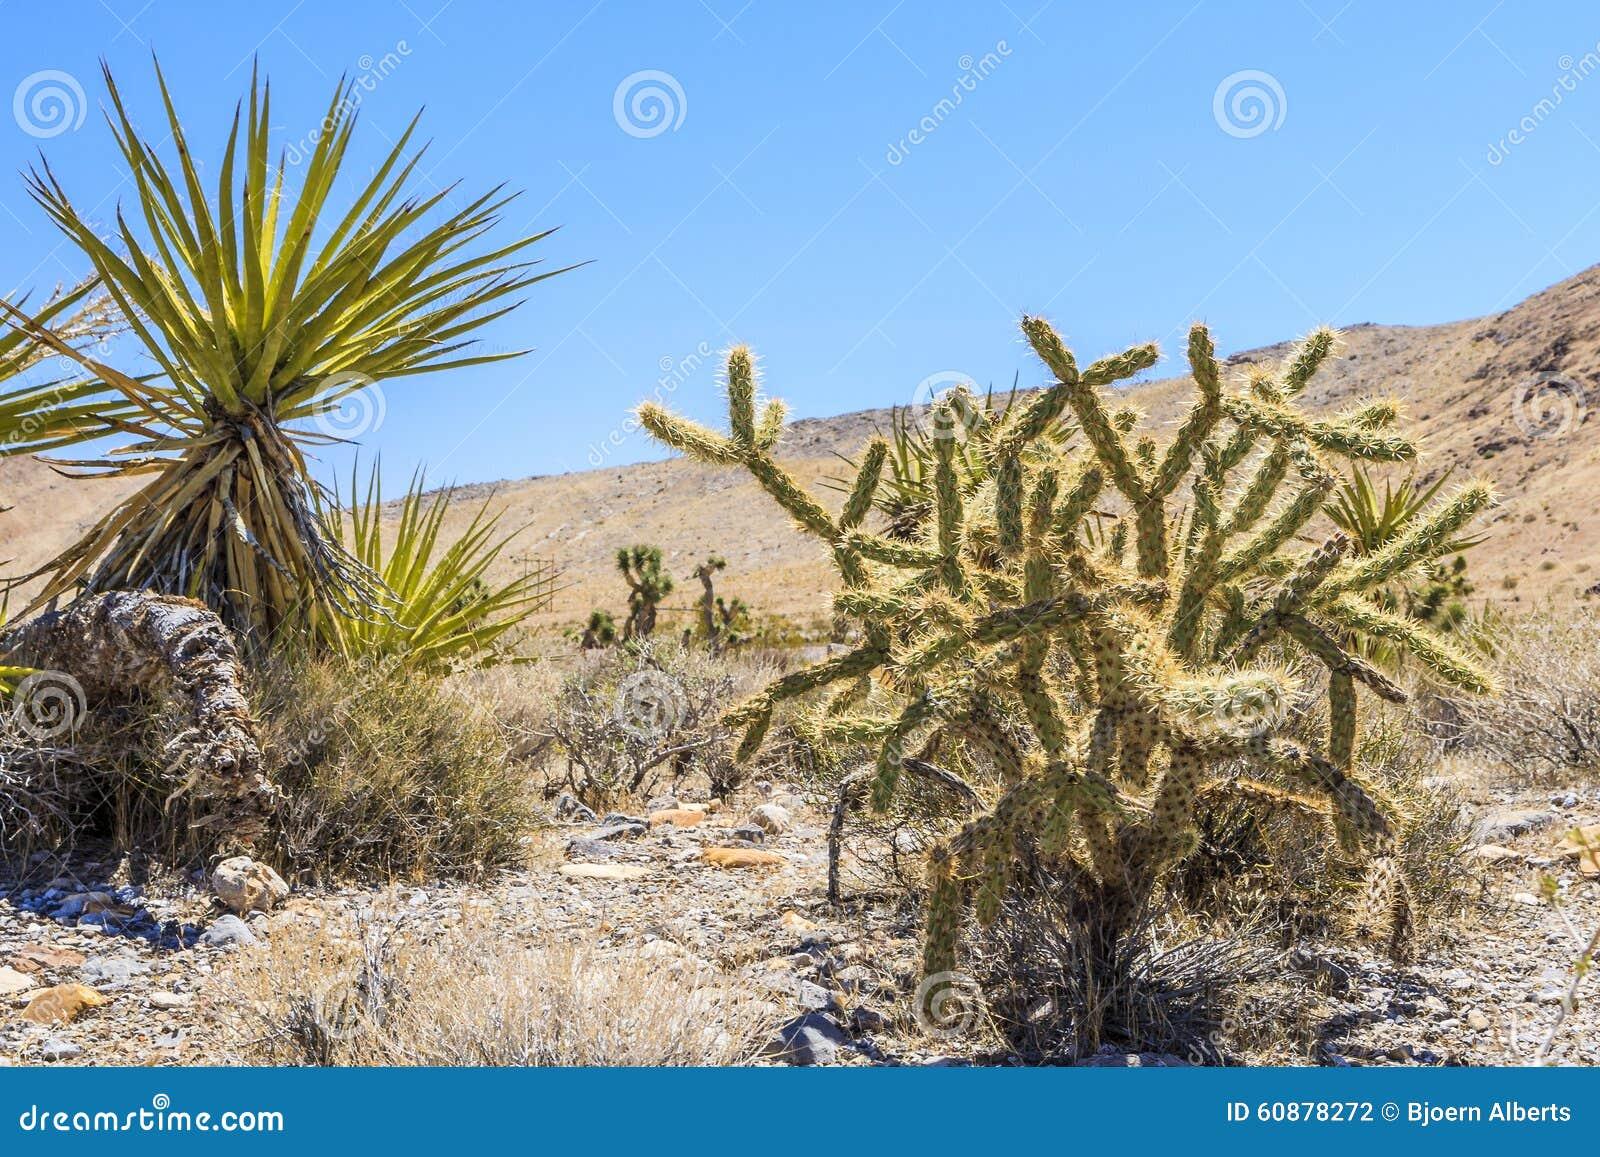 Nature S Sunshine Yucca